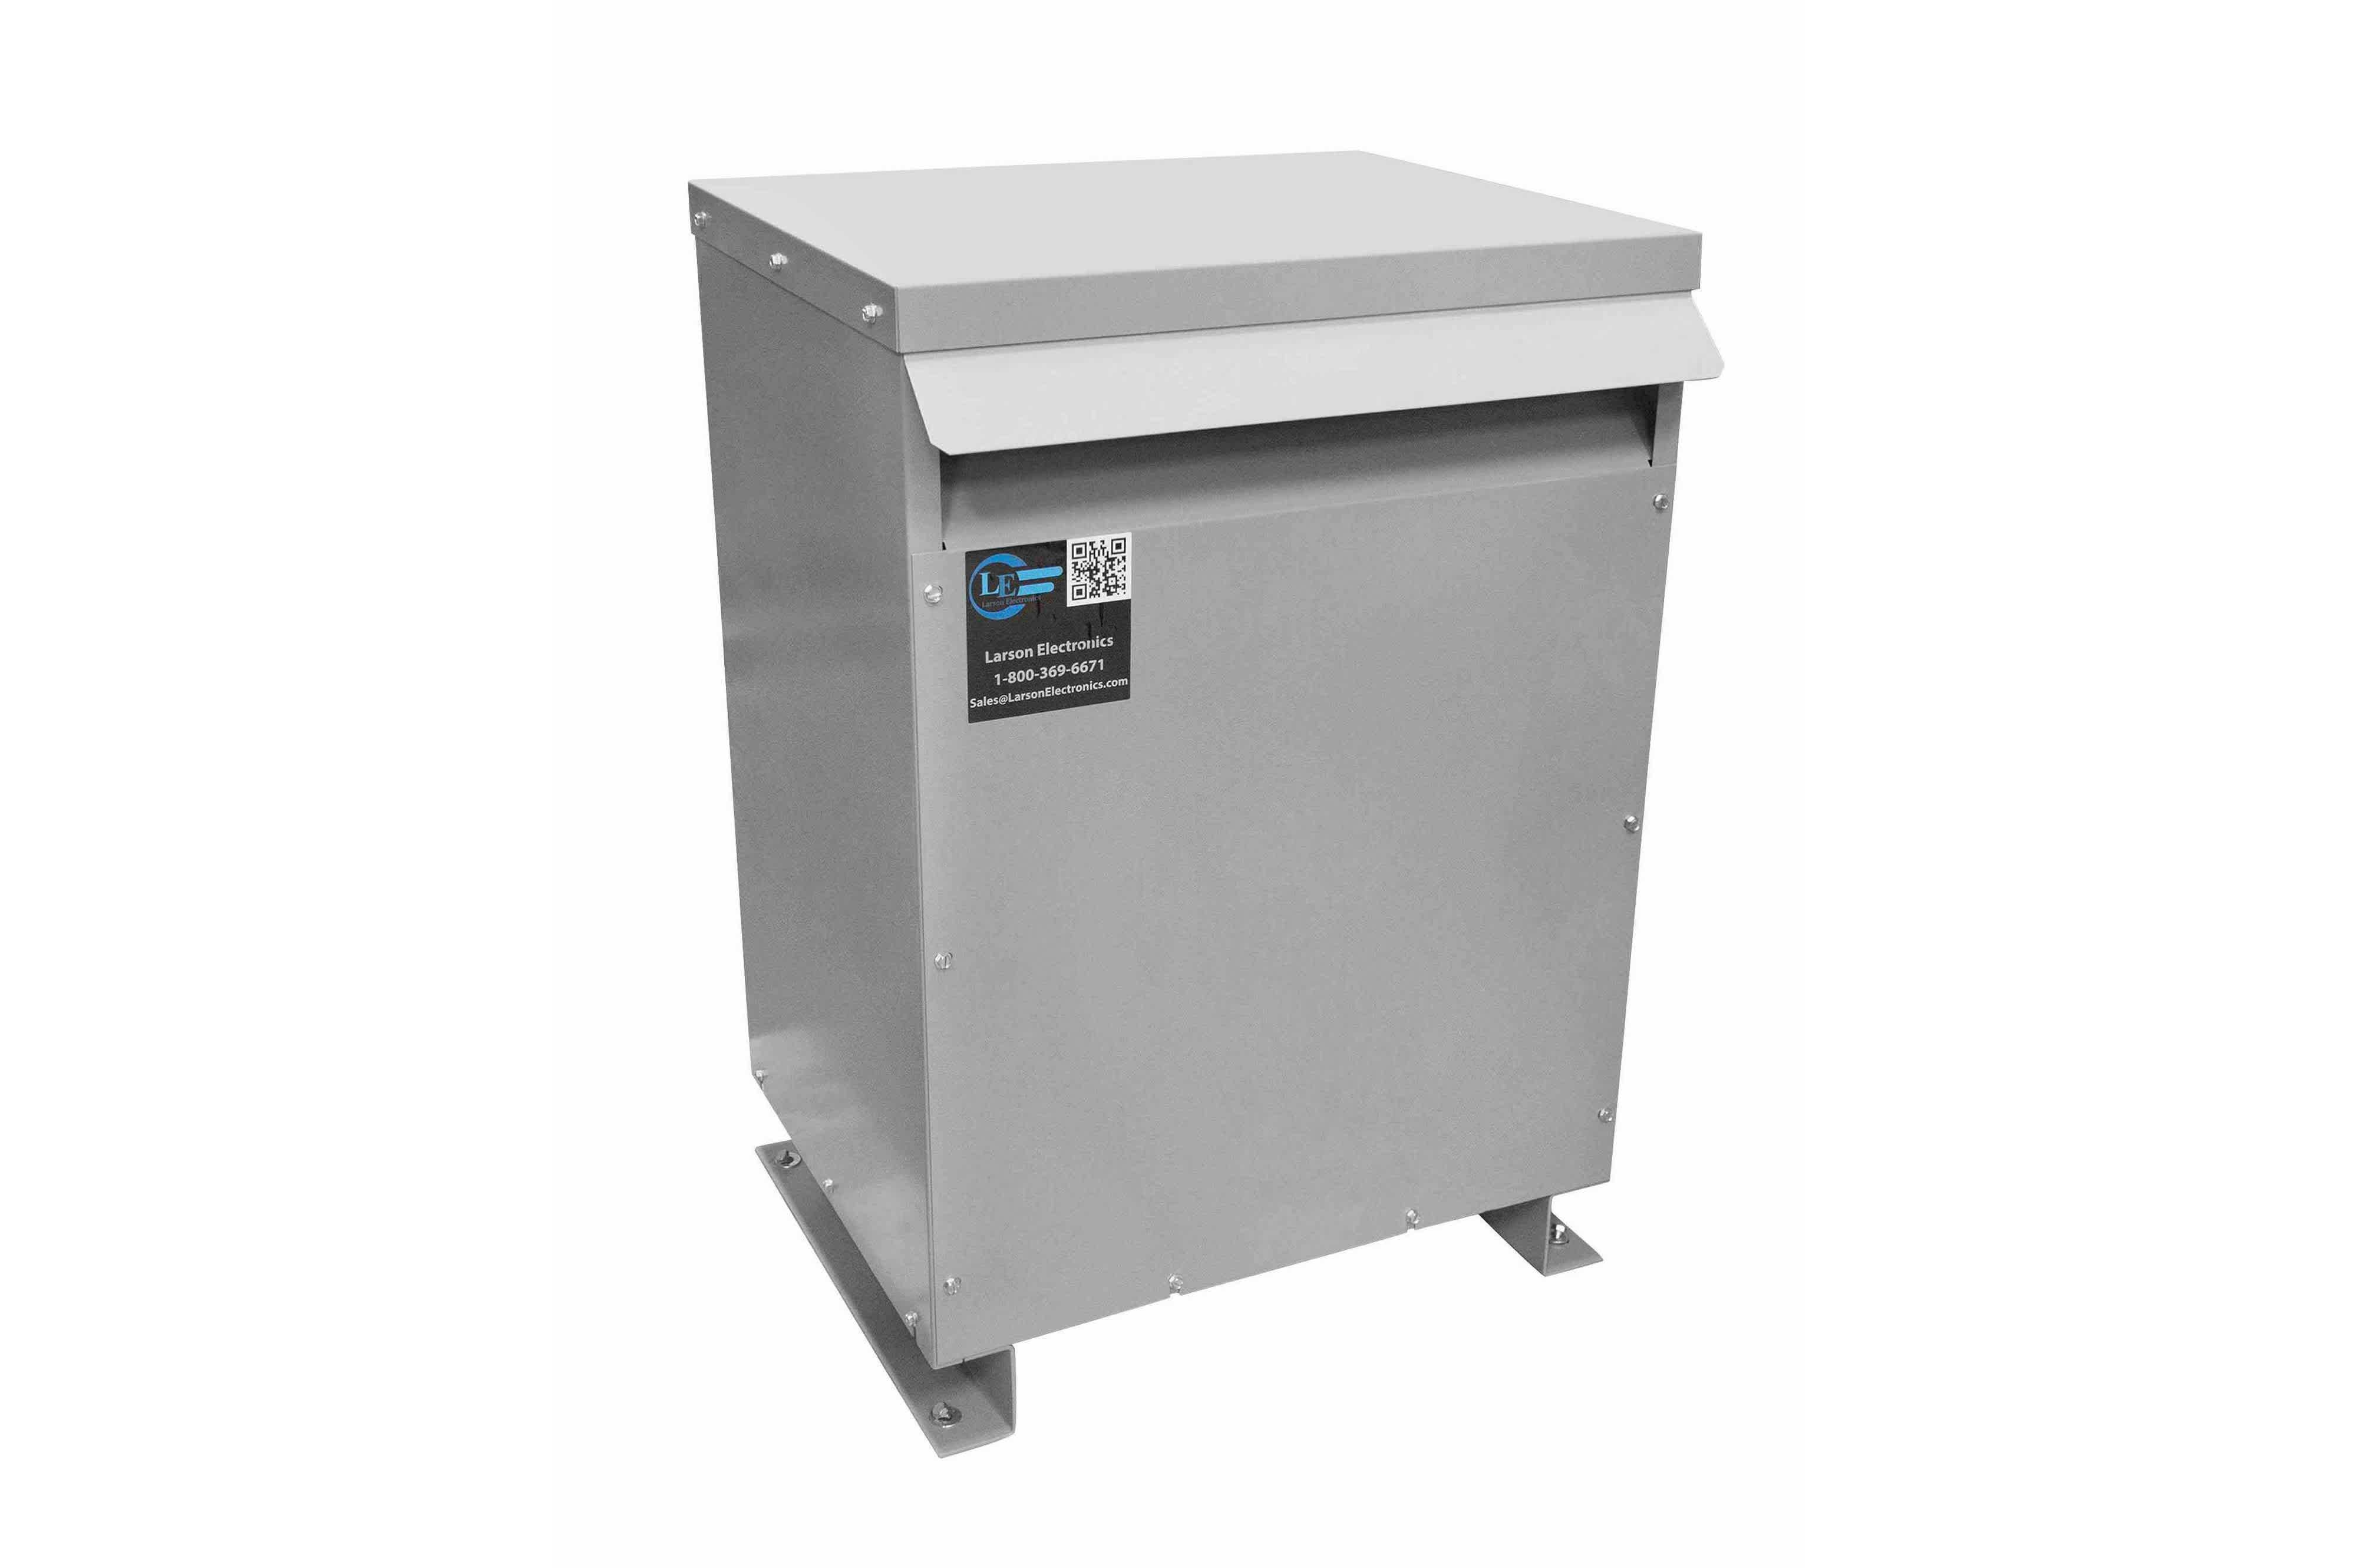 75 kVA 3PH Isolation Transformer, 600V Wye Primary, 400Y/231 Wye-N Secondary, N3R, Ventilated, 60 Hz